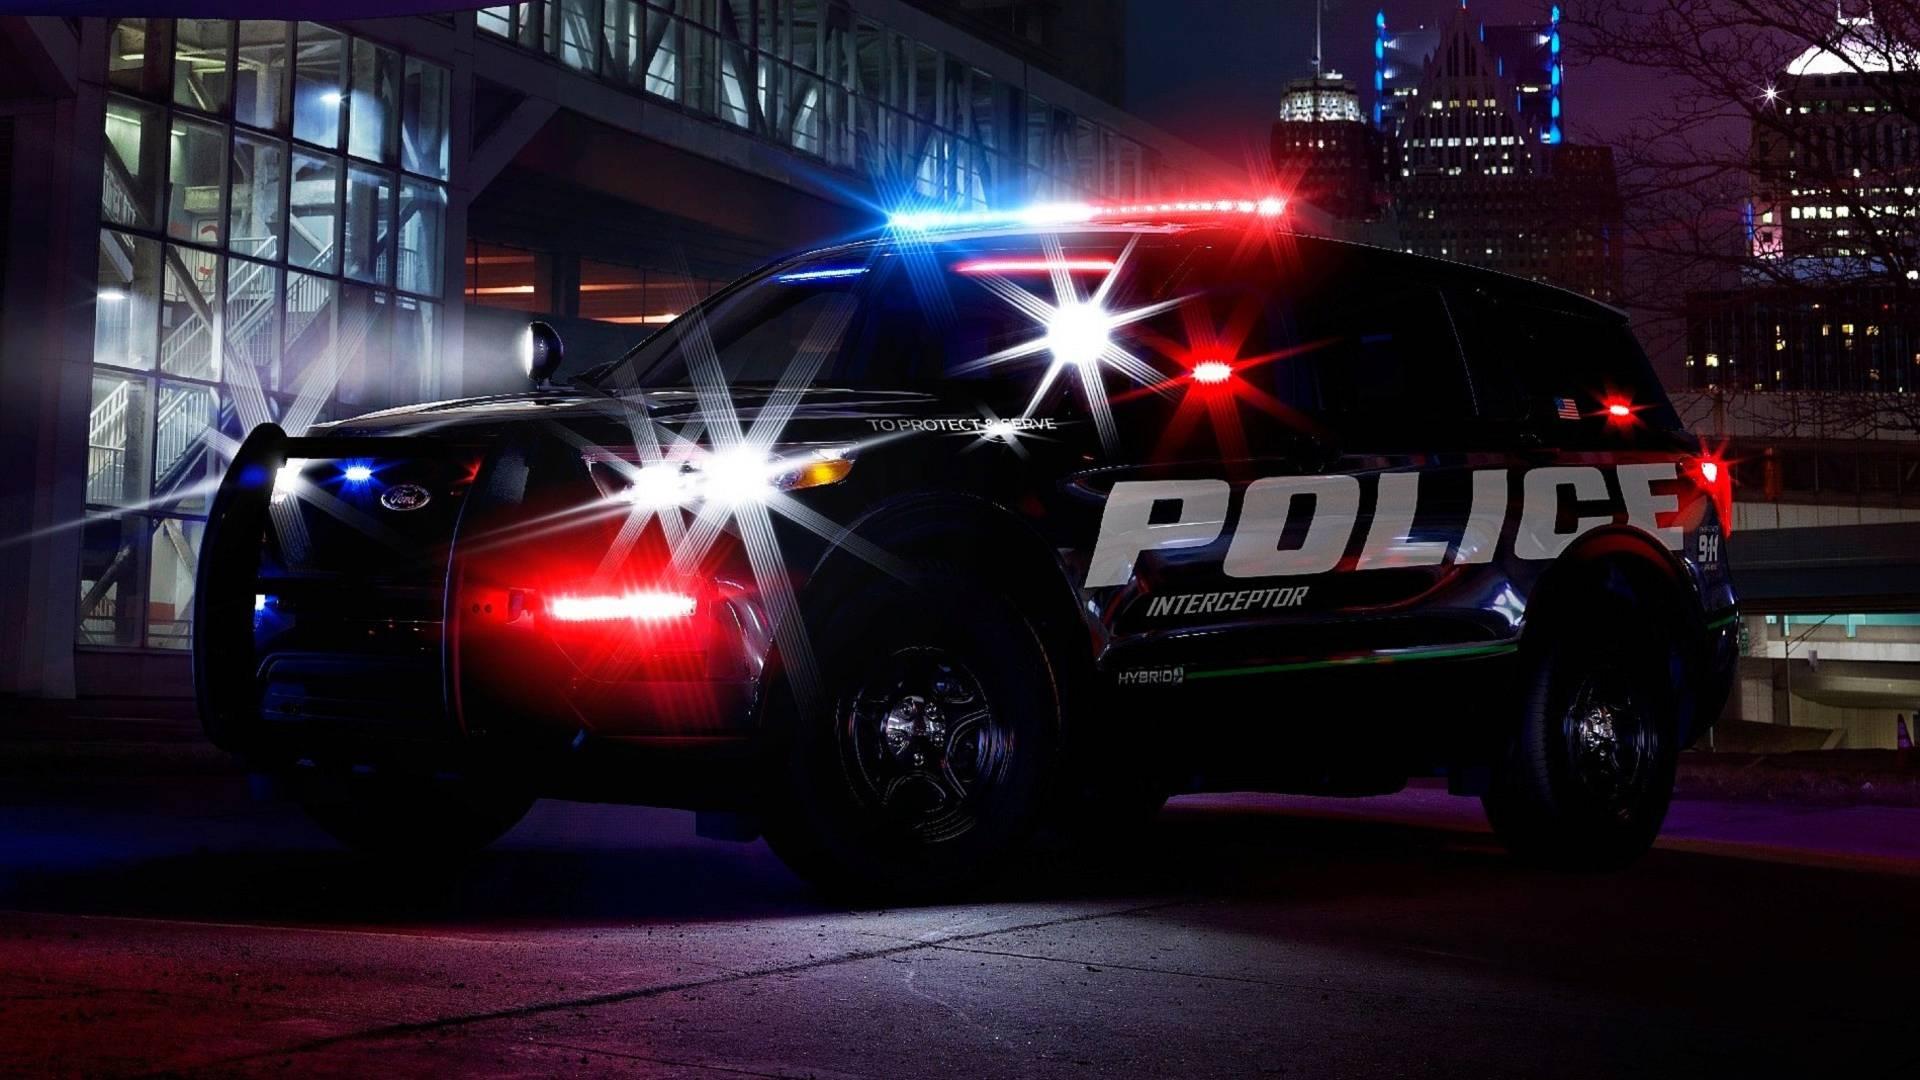 原生車還沒出 警用車先曝光 Ford 新世代 Police Interceptor